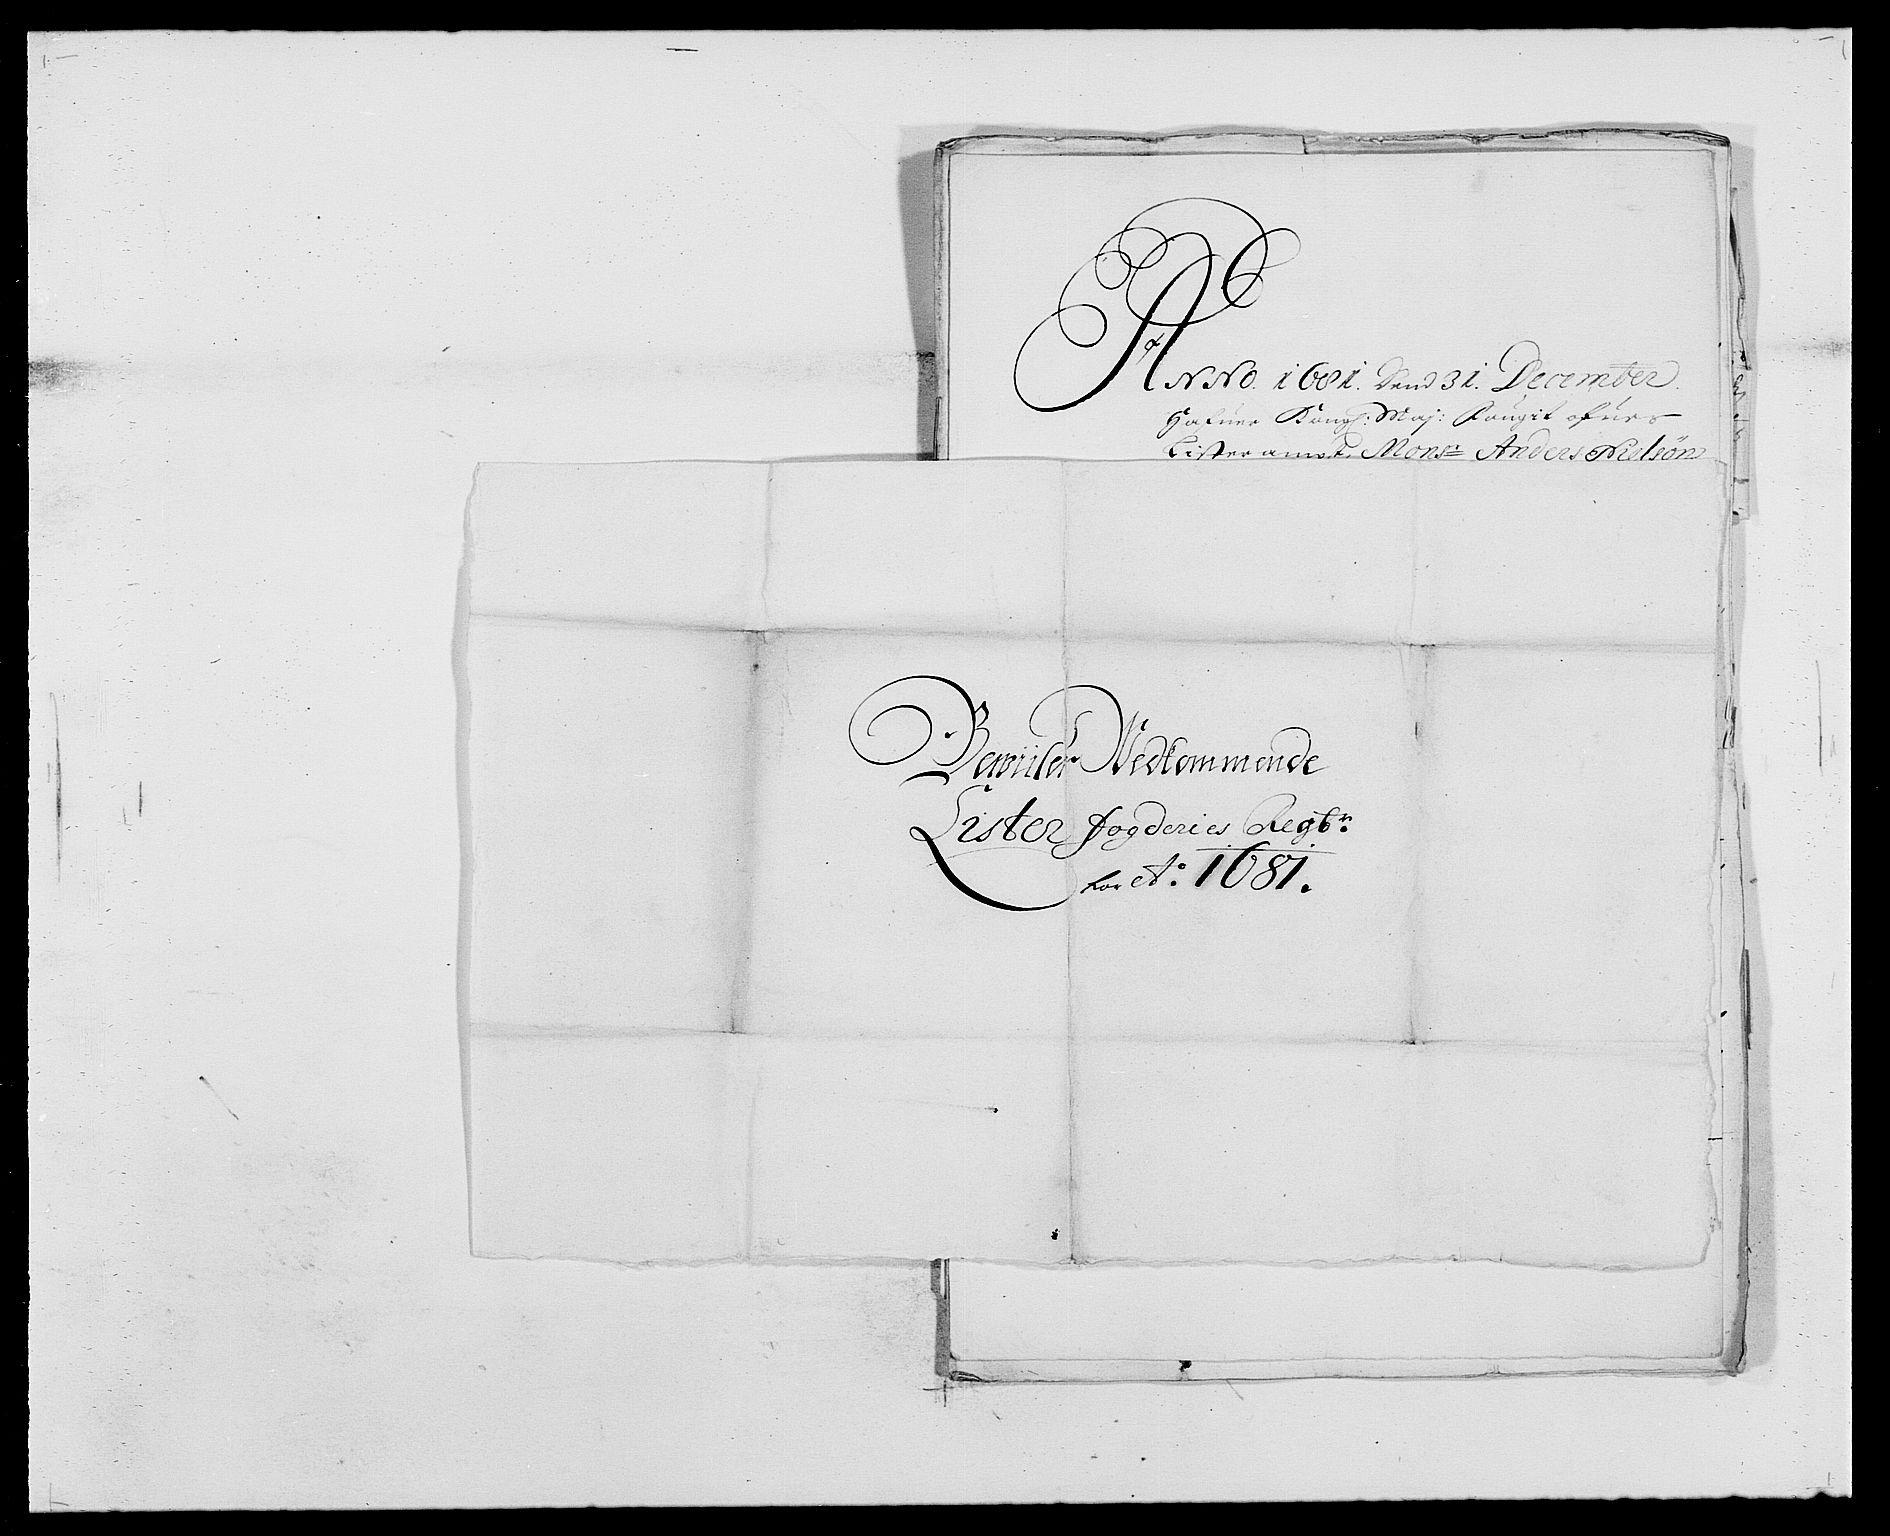 RA, Rentekammeret inntil 1814, Reviderte regnskaper, Fogderegnskap, R41/L2531: Fogderegnskap Lista, 1680-1682, s. 155